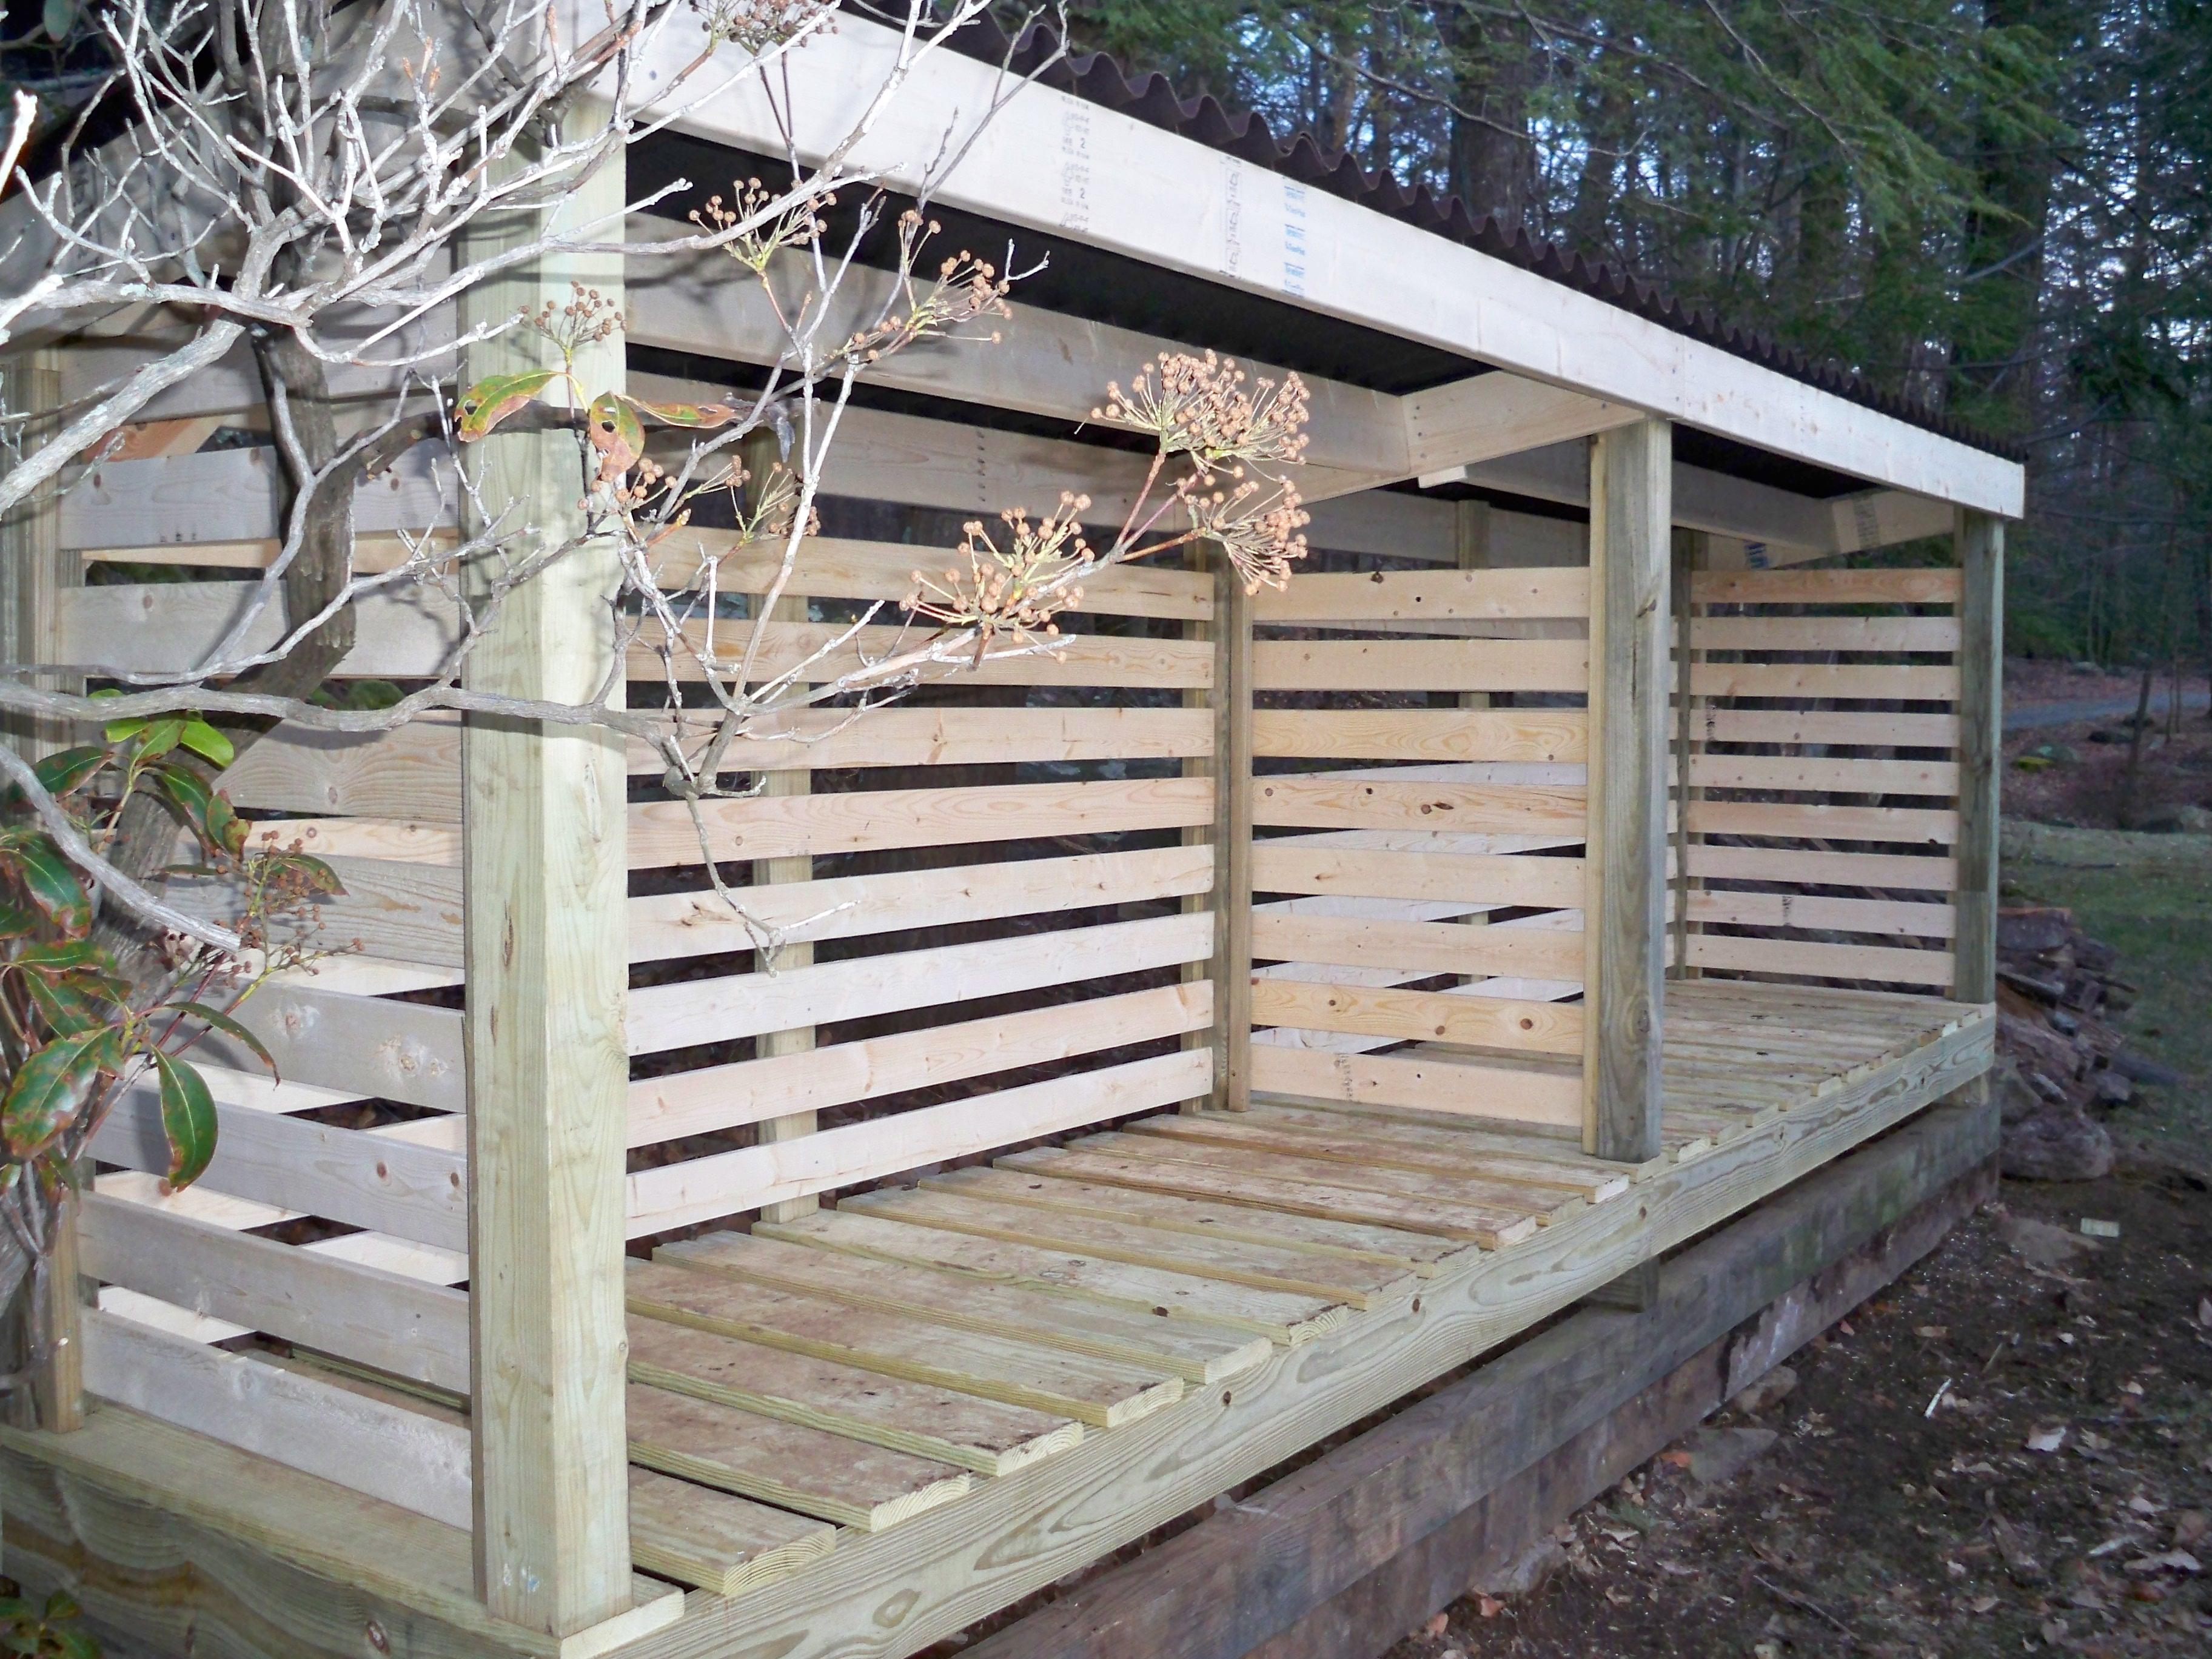 The Oscawana Large Capacity Custom Wood Shed